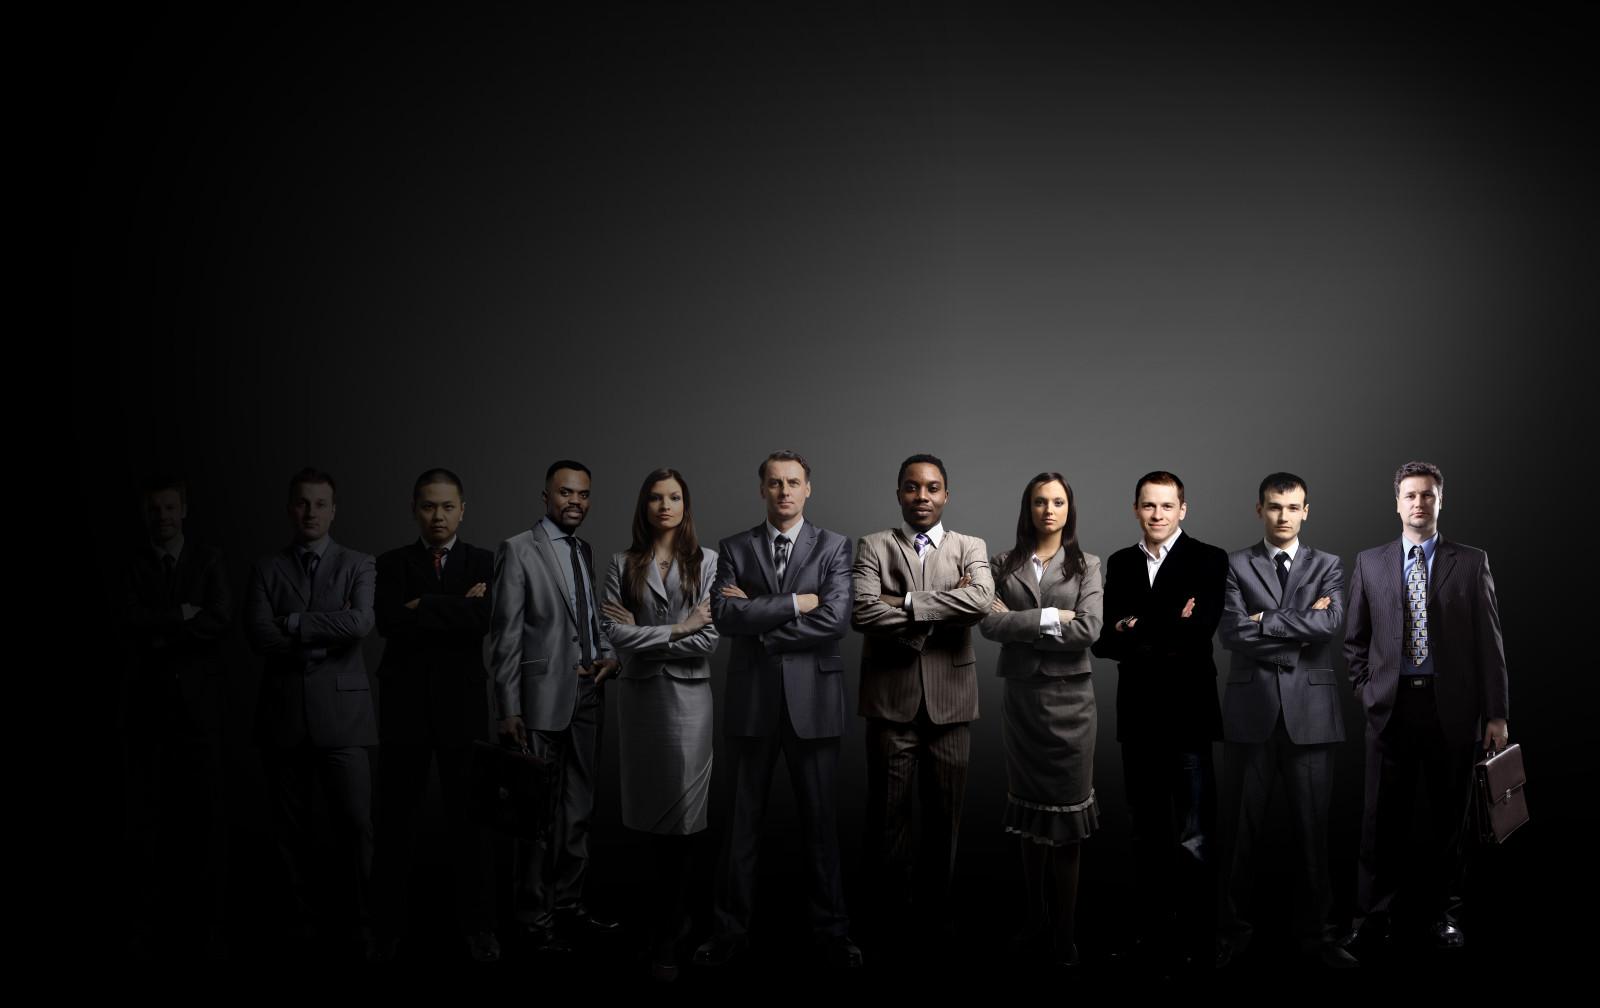 Line up of business entrepreneurs